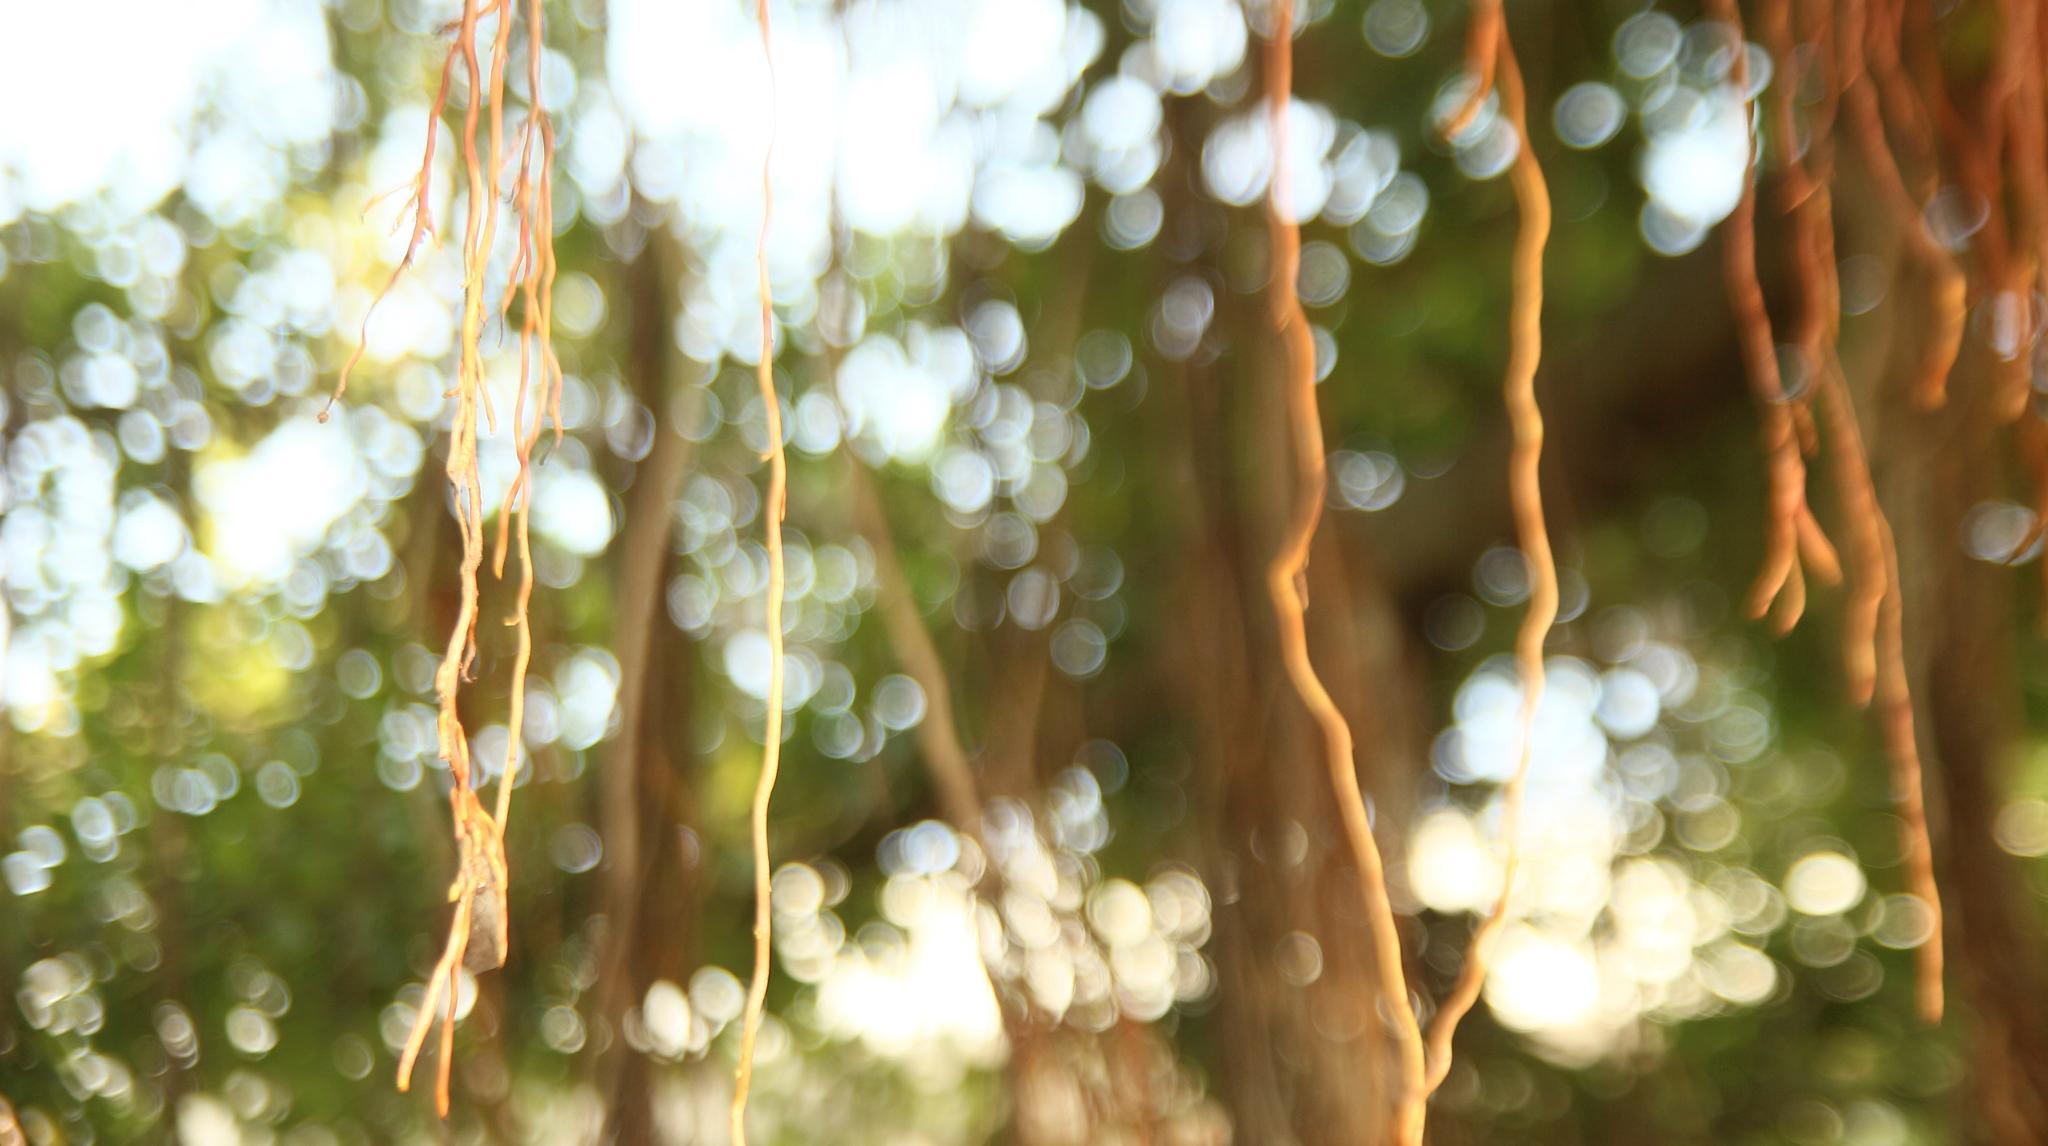 light-roots by GitiThadani